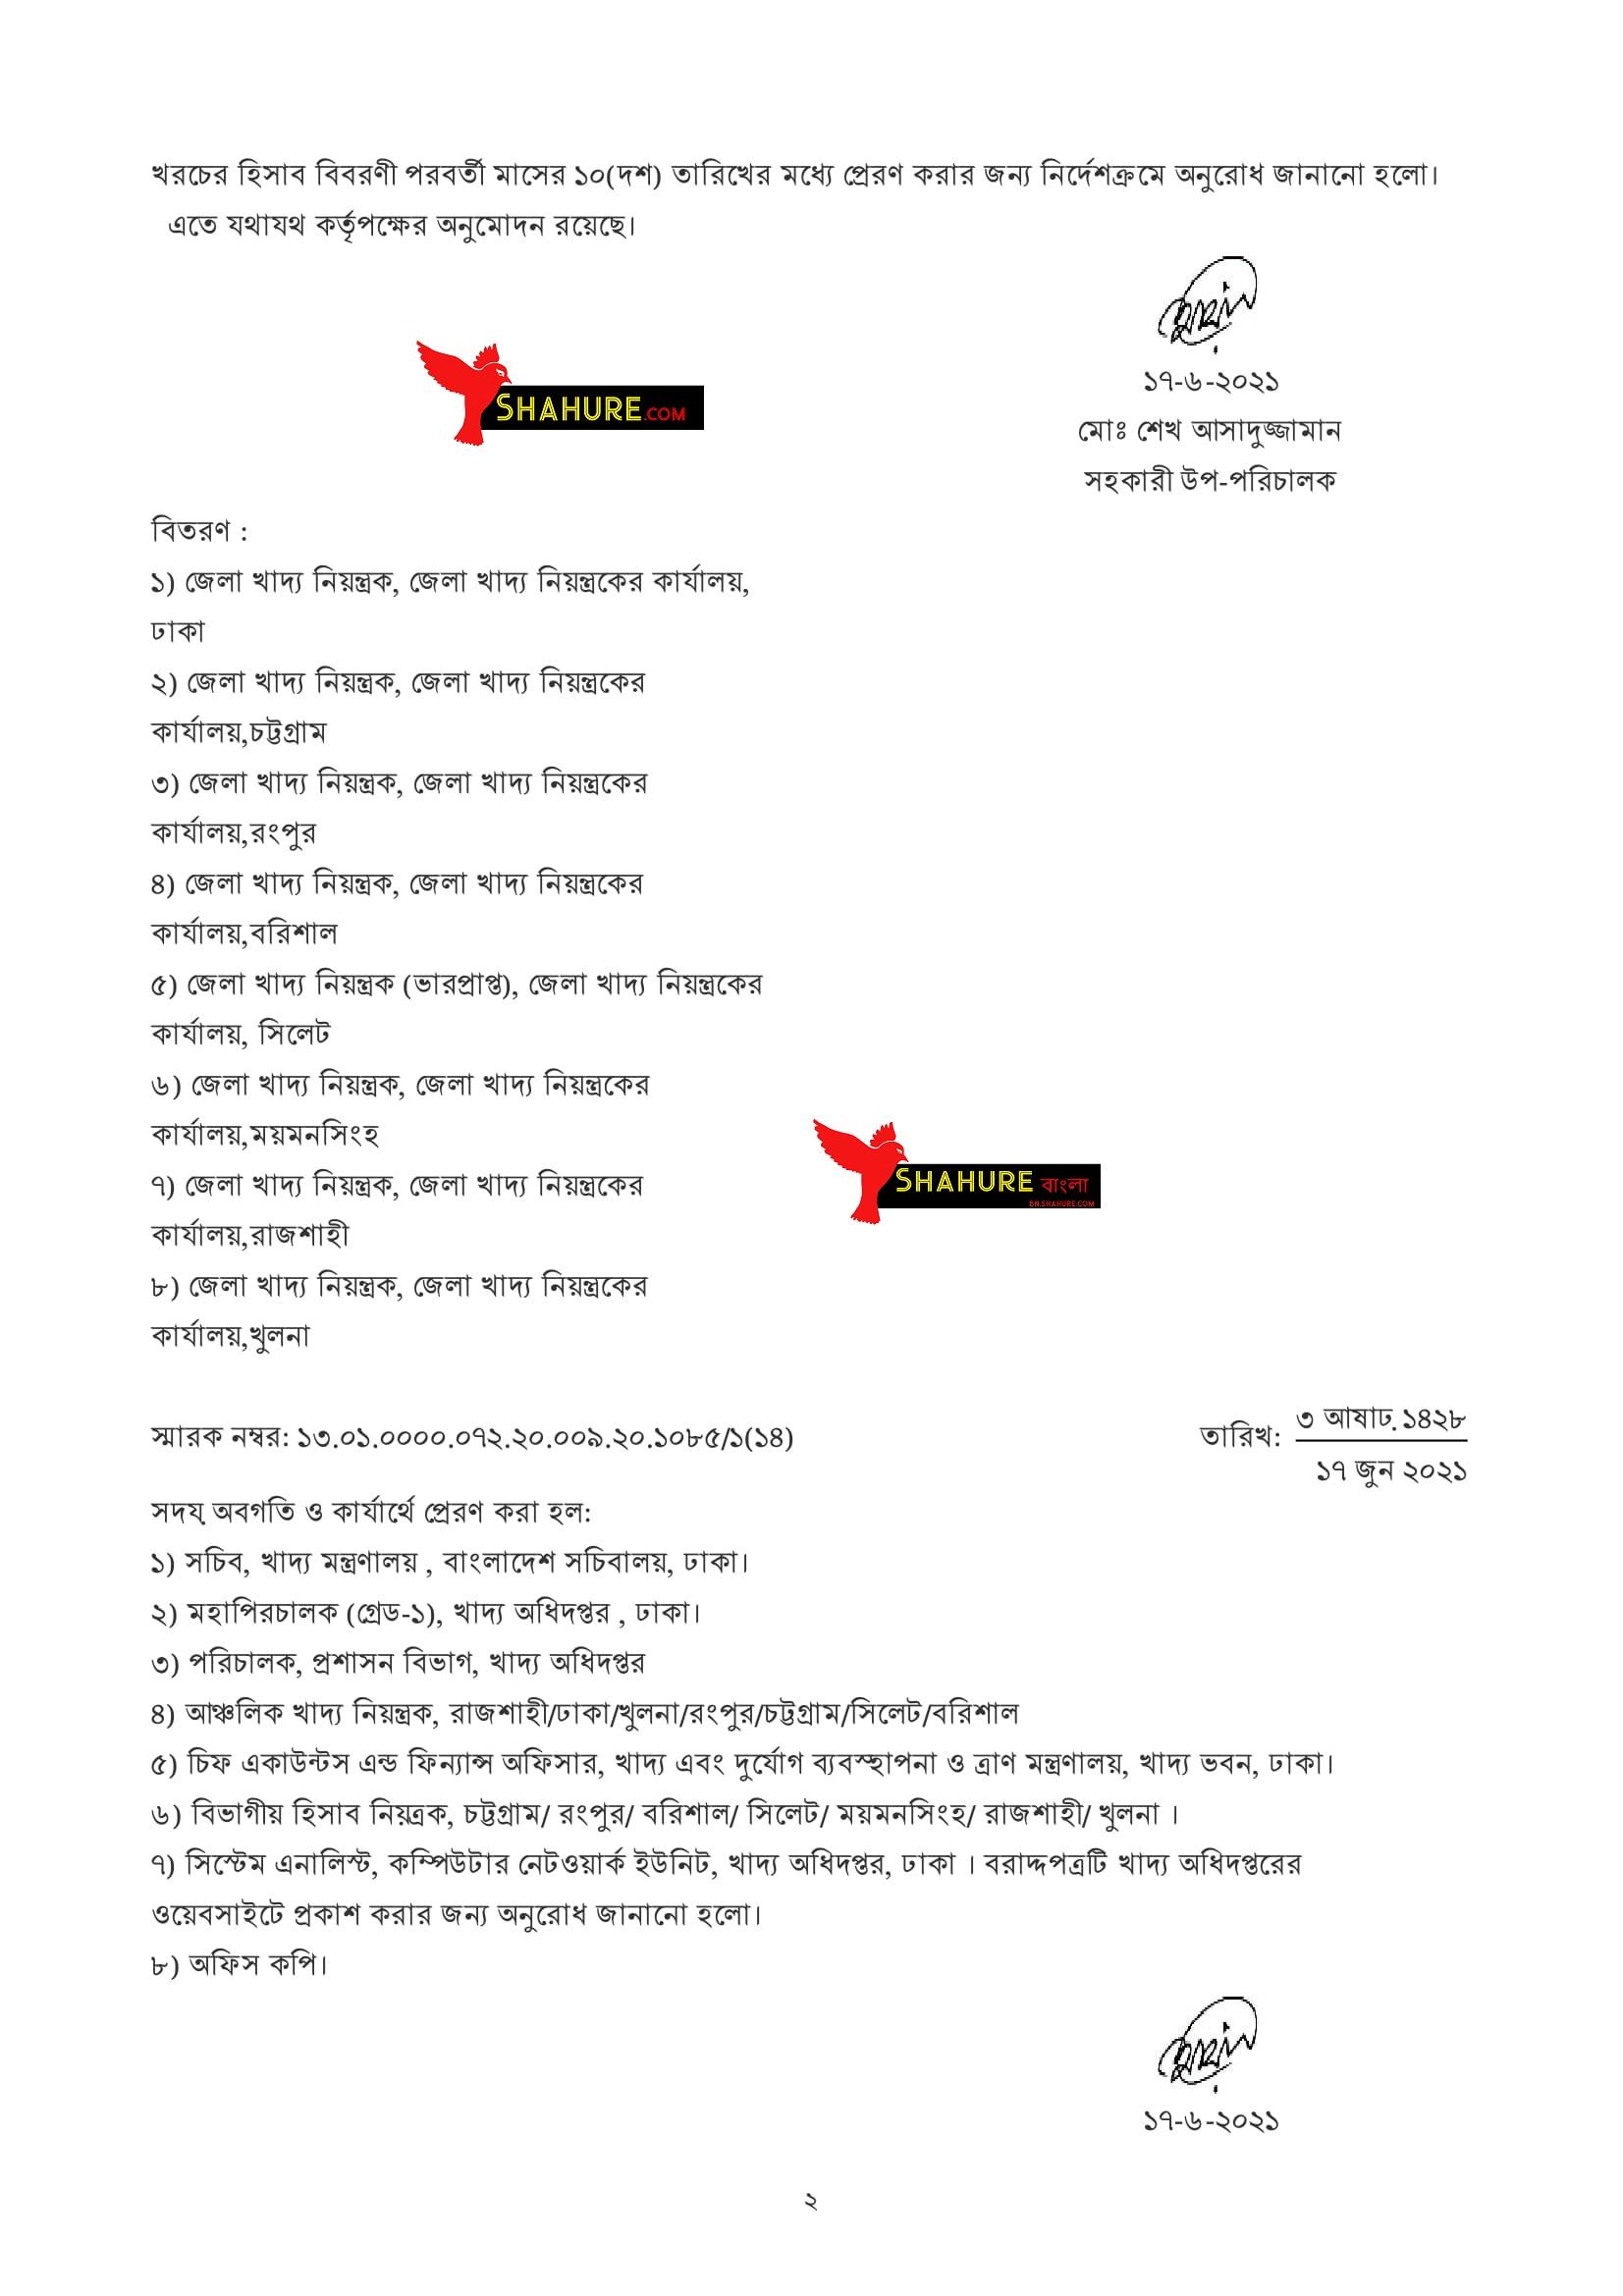 DgFood Exam Related Notice